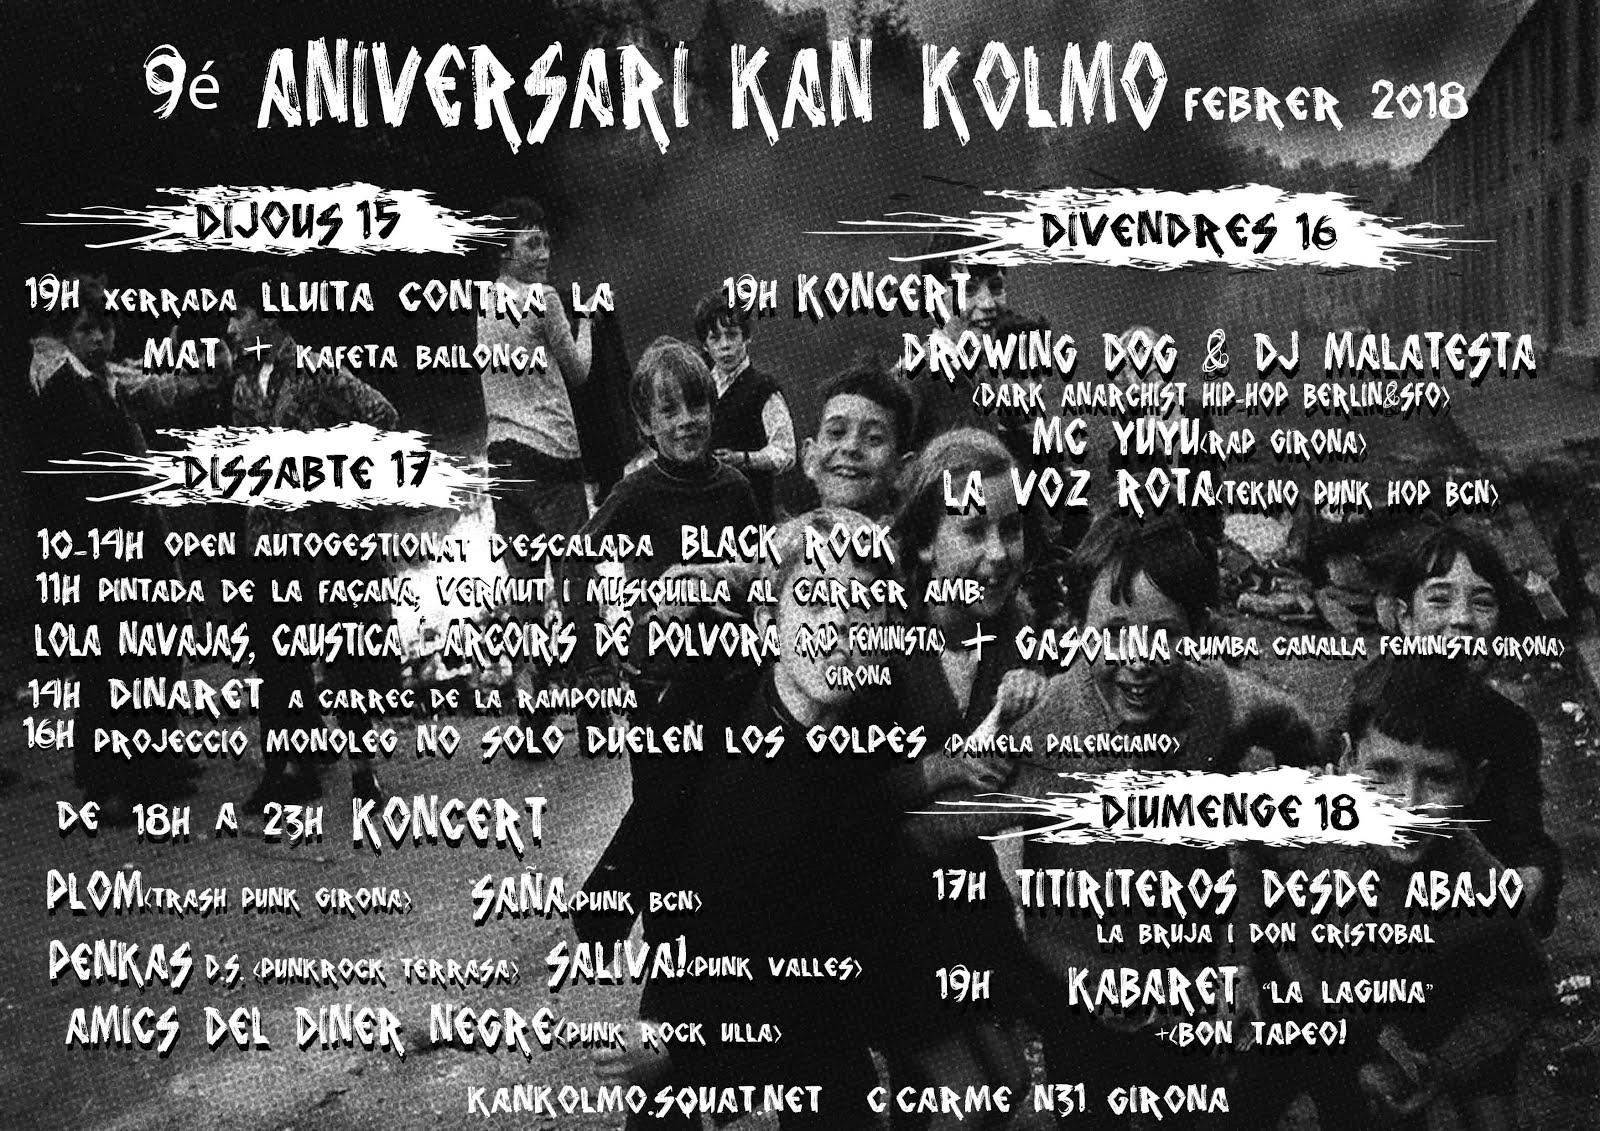 15-16-17-18 de febrer: 9è aniversari del Centre Social Okupat Kan Kolmo